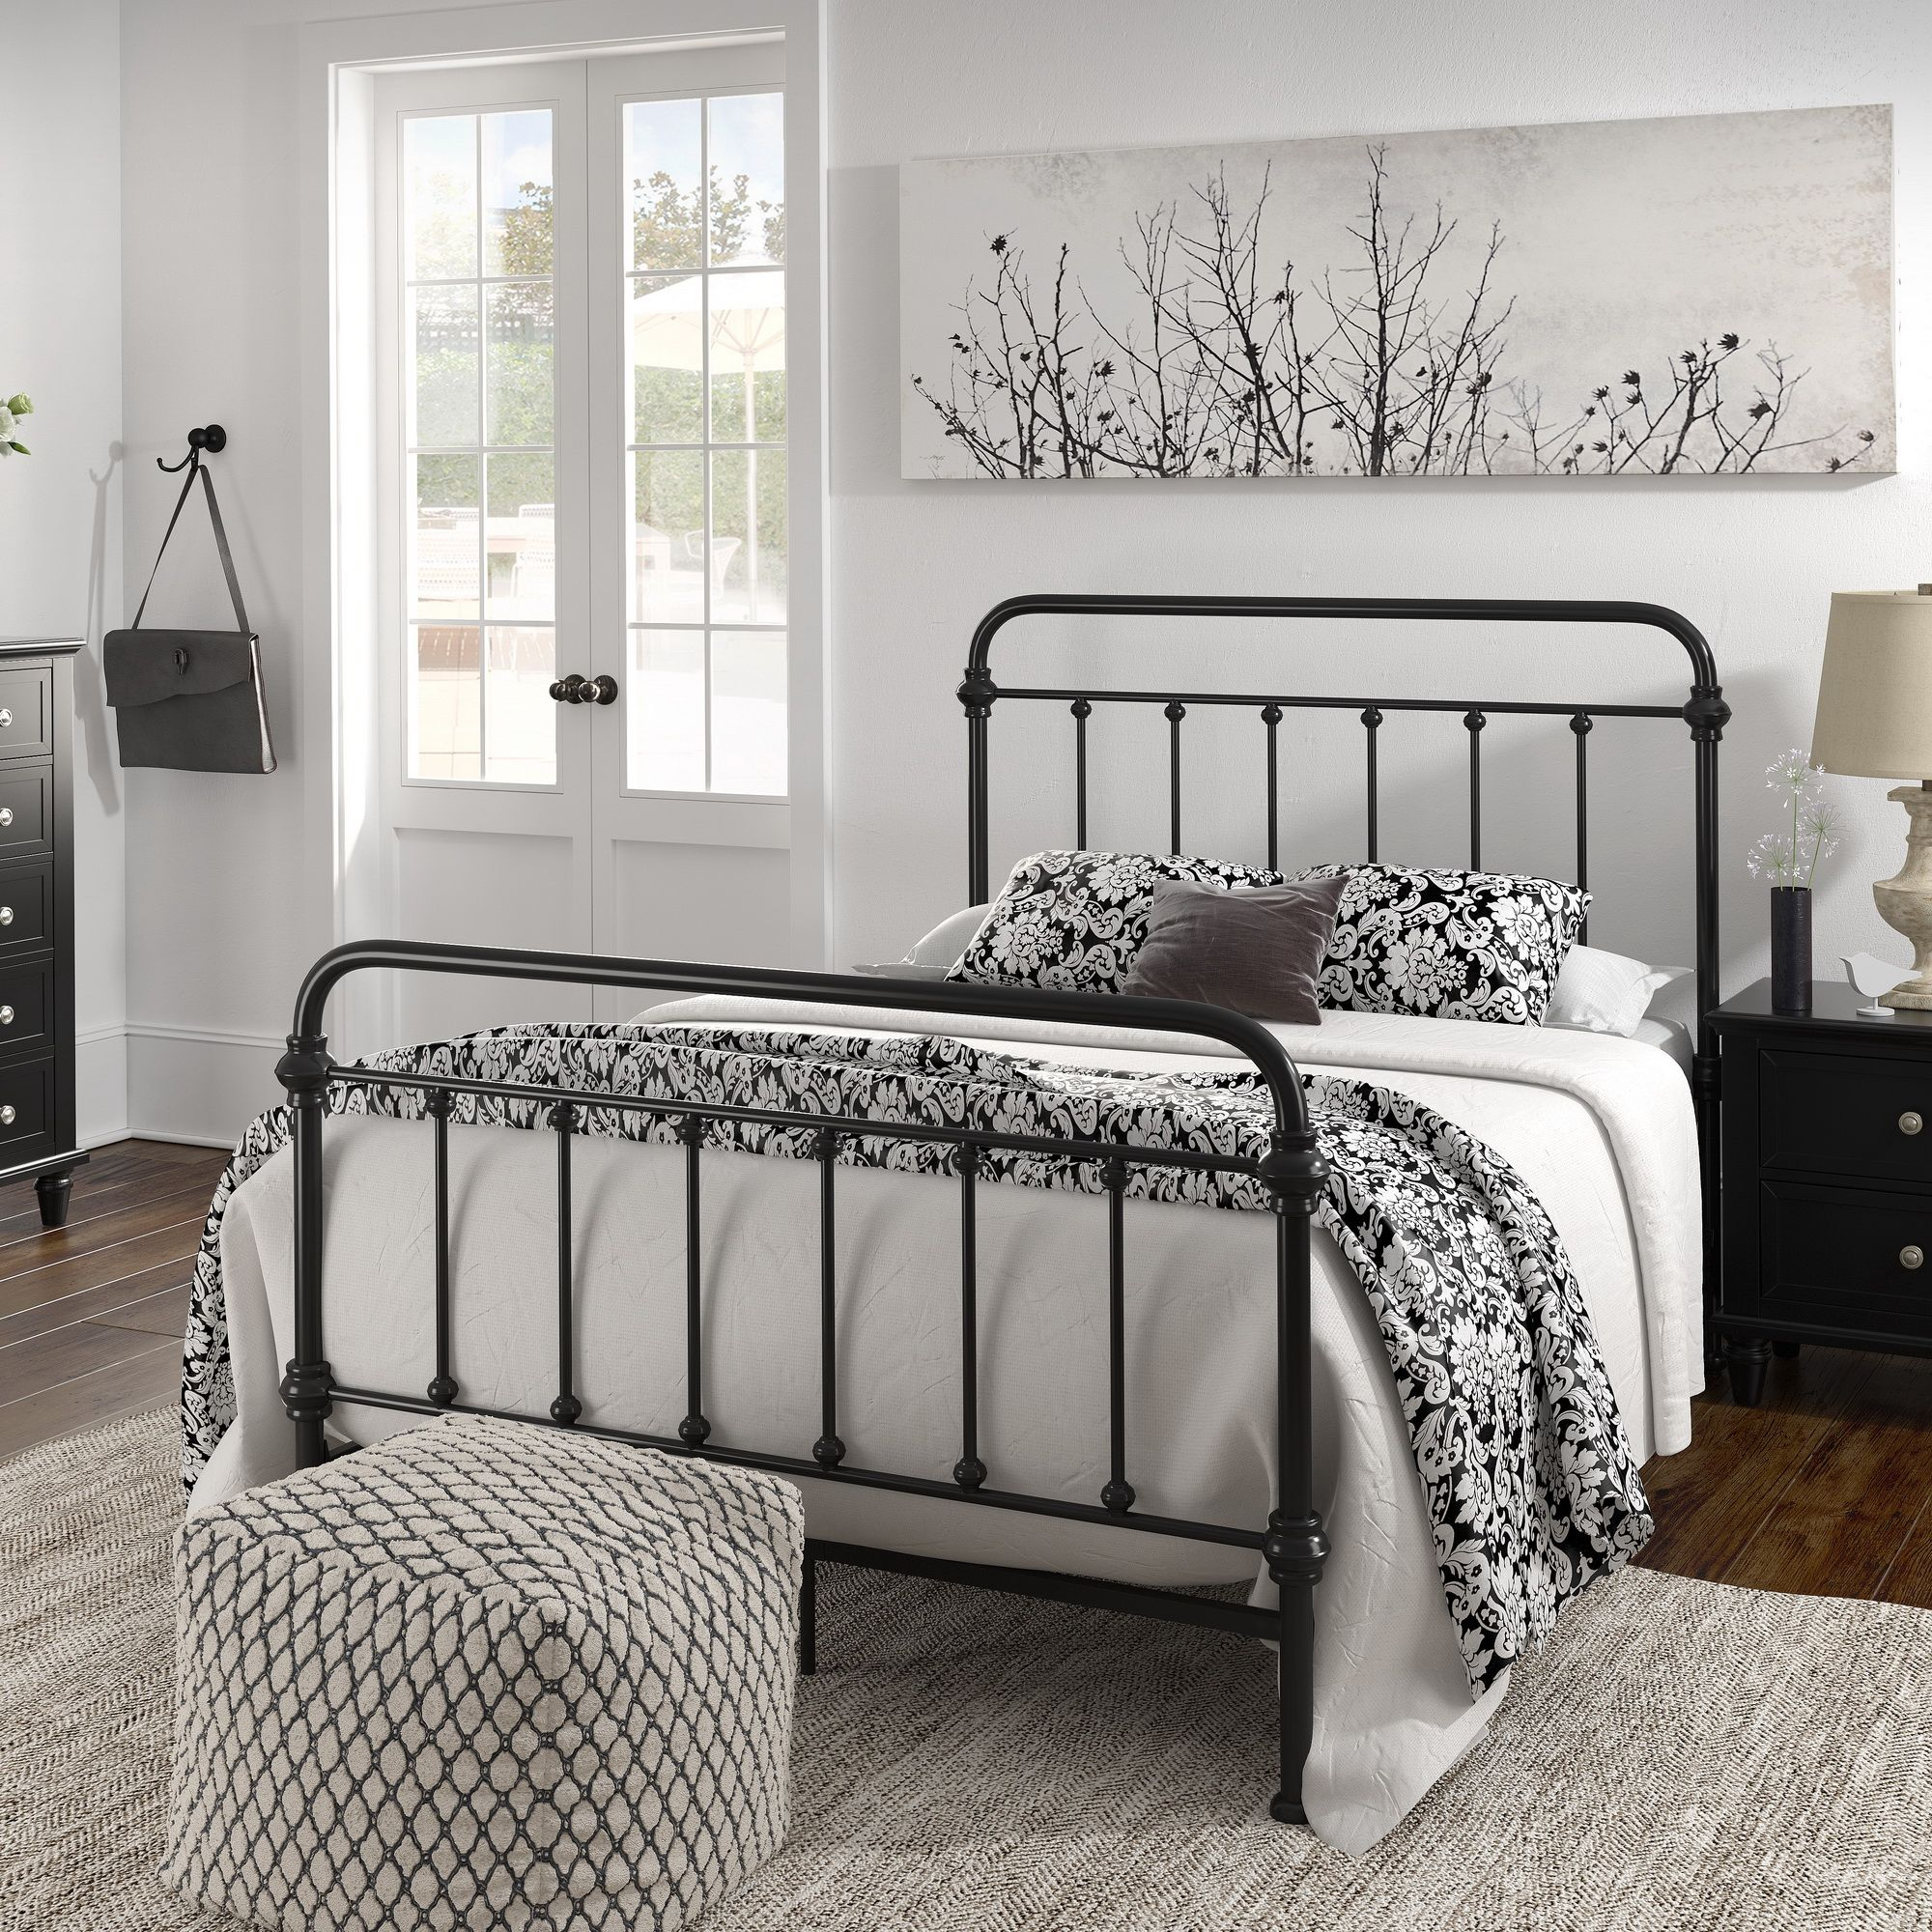 Weston Home Nottingham Metal Full Bed Antique Black Walmart Com In 2021 Black Bed Frame Iron Bed Frame Black Metal Bed Frame Black metal bed frame full